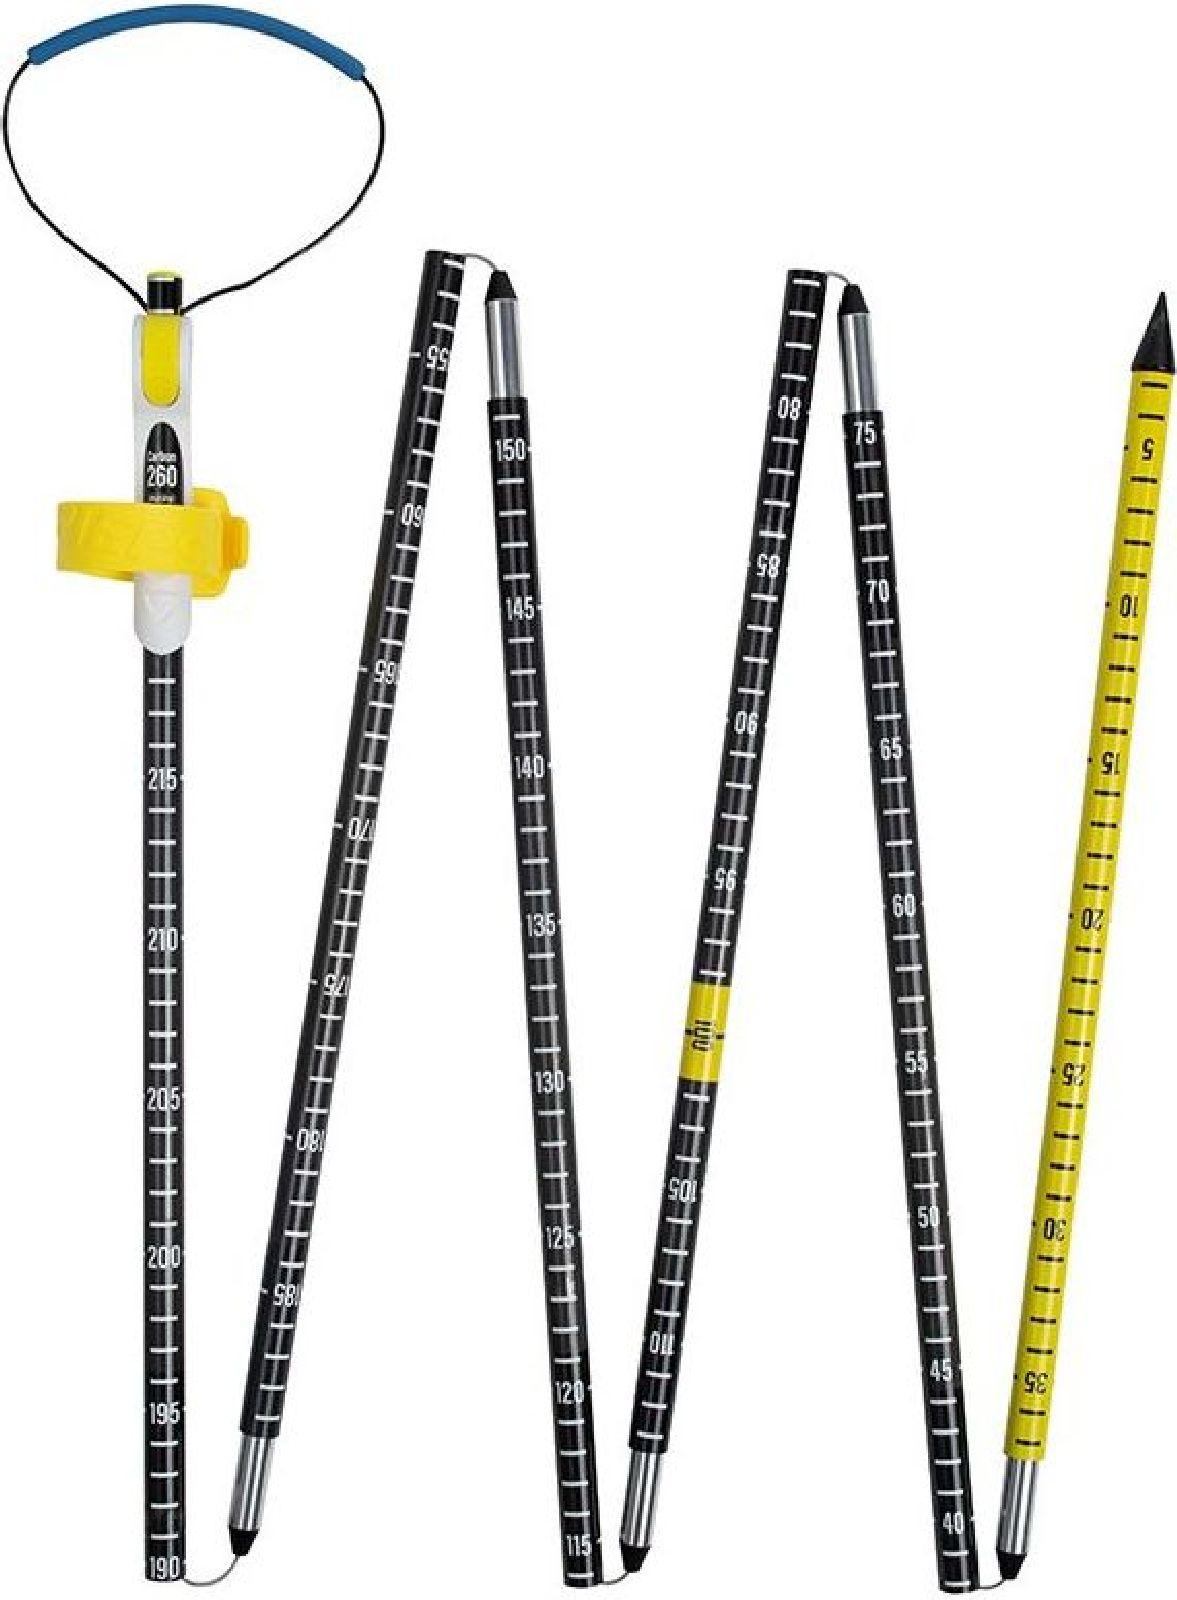 Pieps Probe Carbon 260 Pro - black/yellow uni